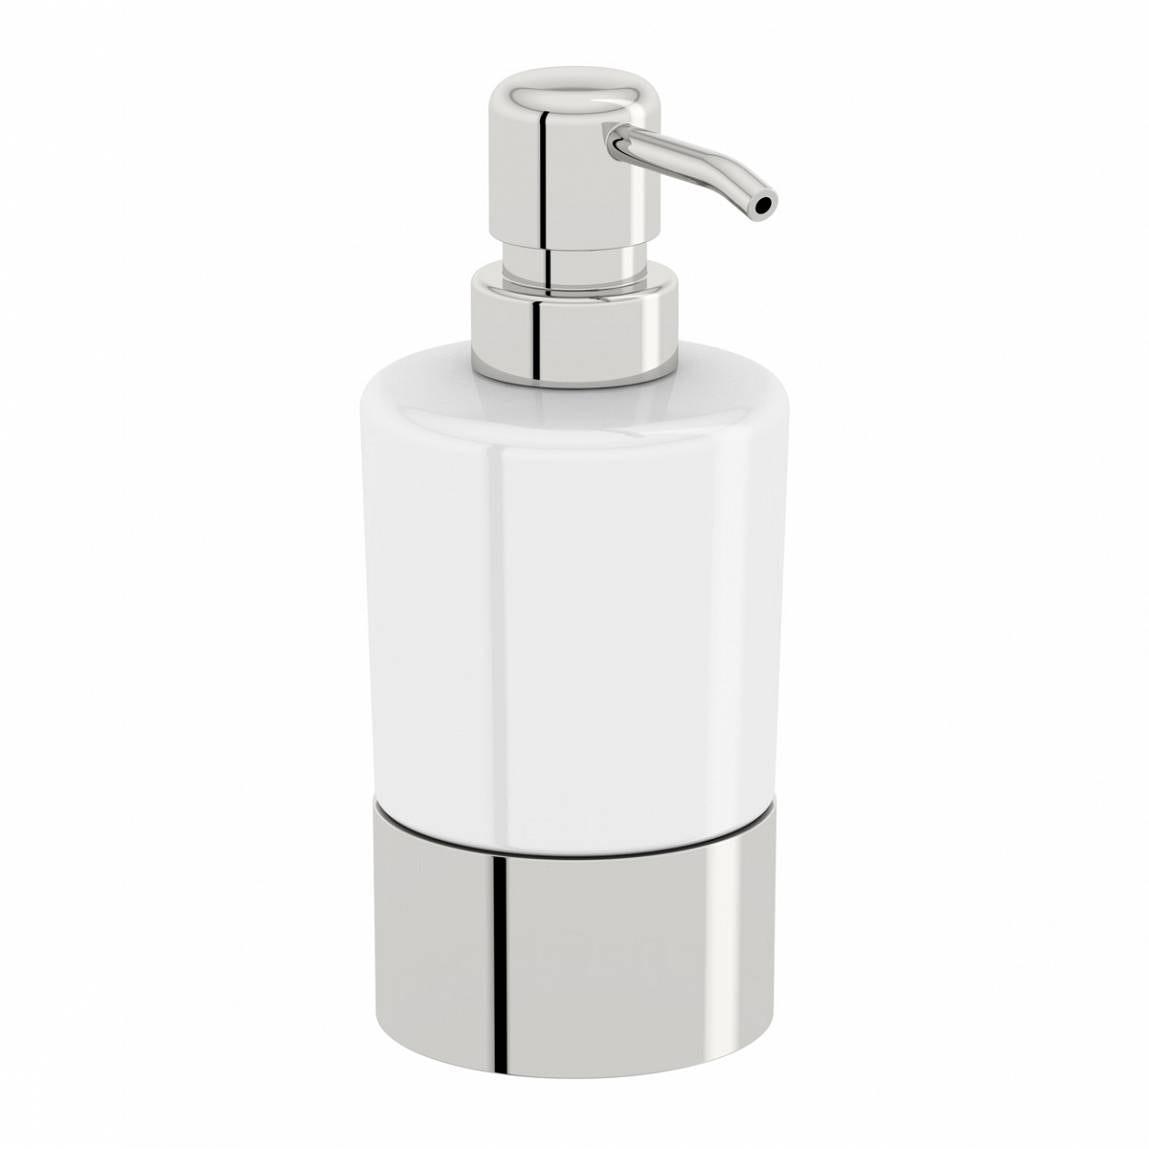 Orchard Options freestanding ceramic soap dispenser